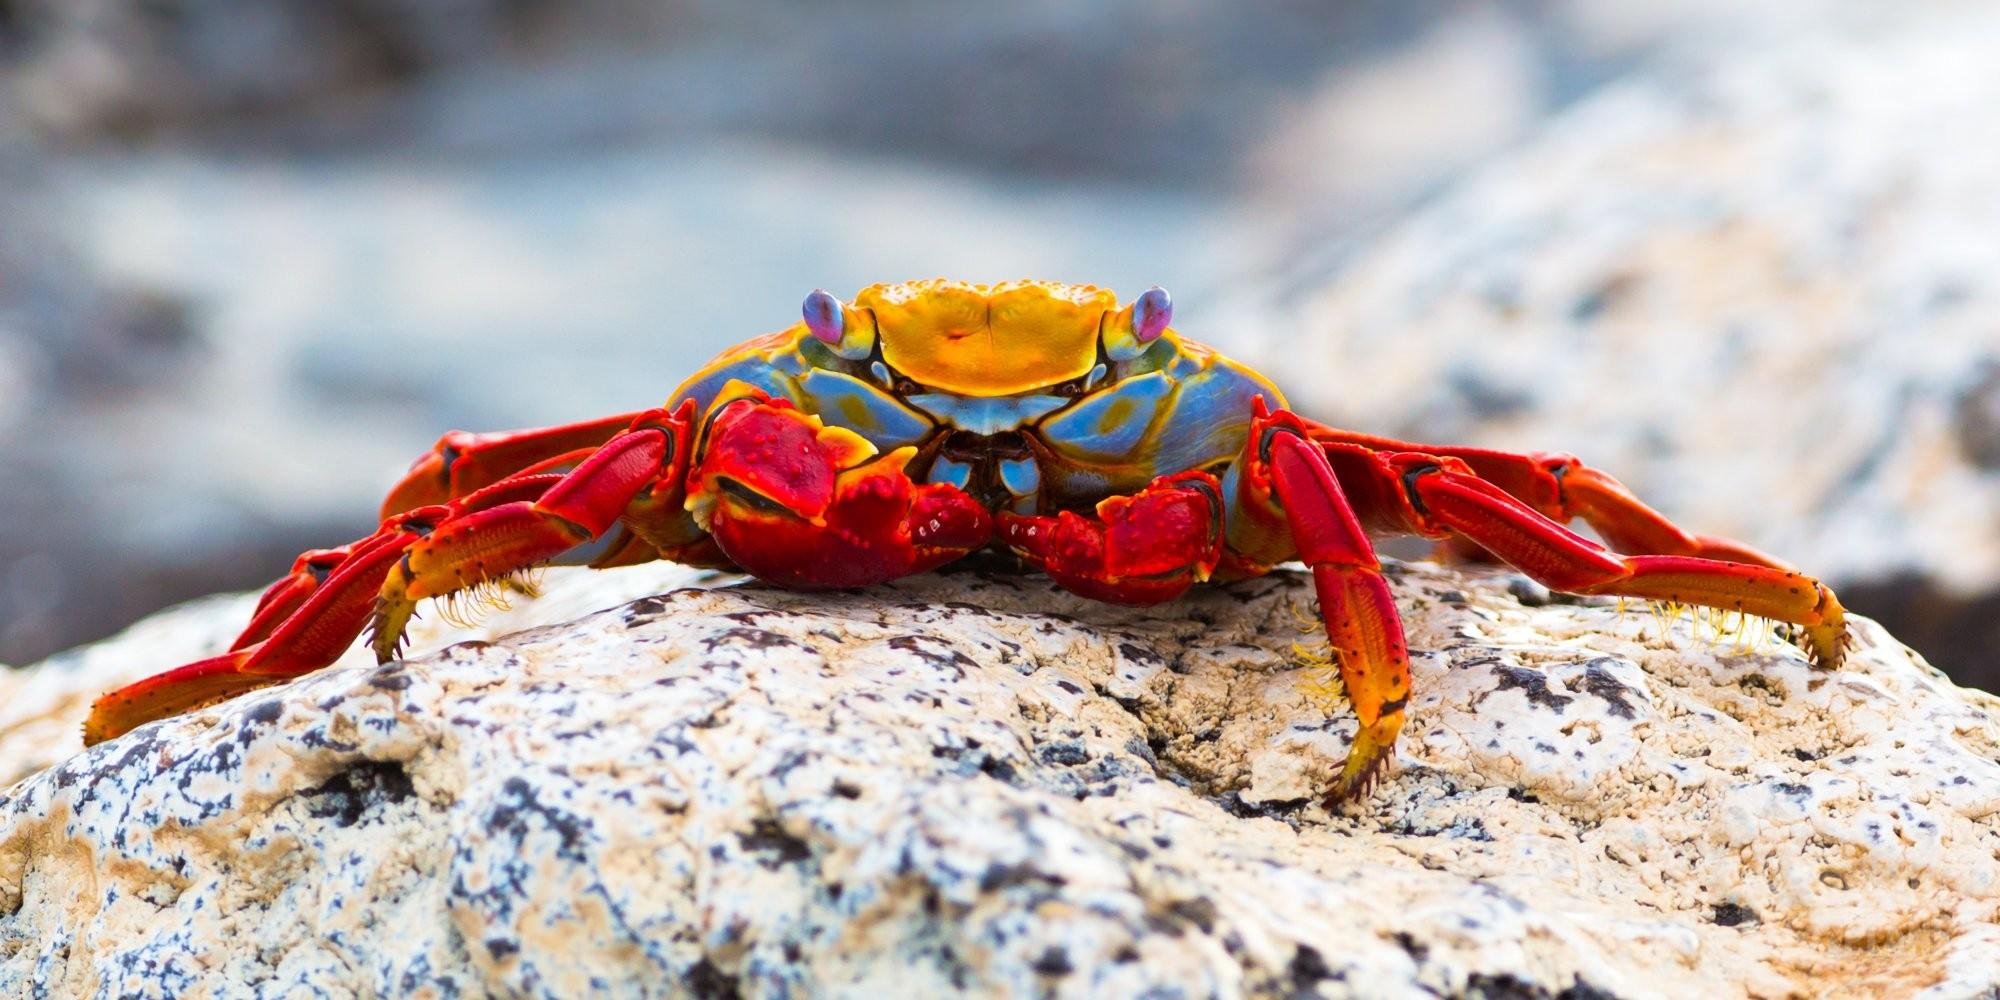 Sally Lightfoot crab in Galapagos Ecuador